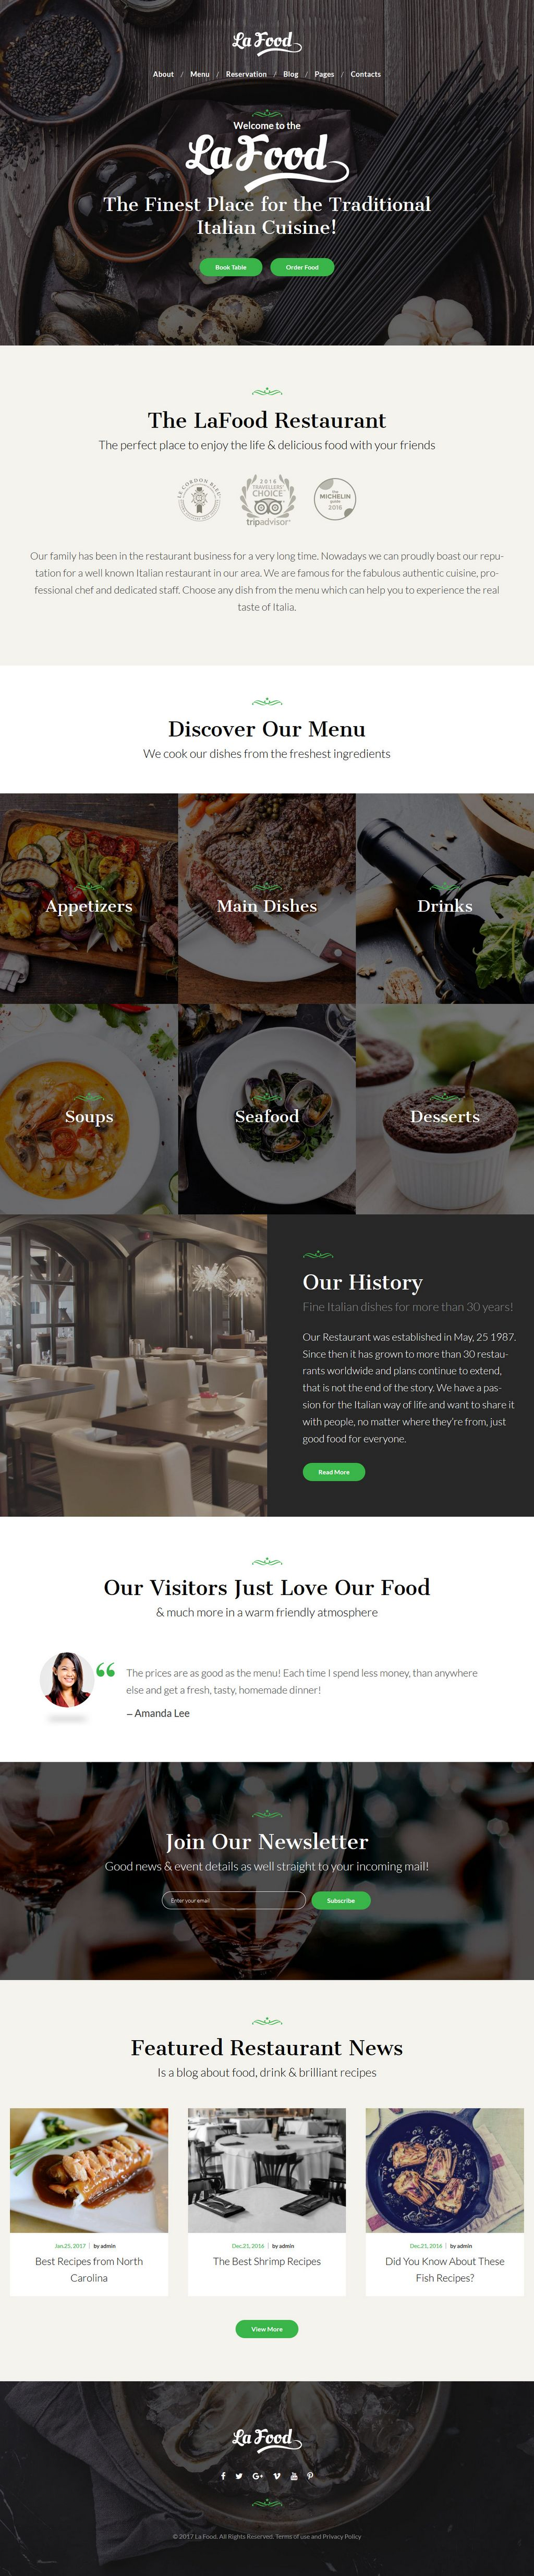 la food wordpress theme restaurants 01 - la-food-wordpress-theme-restaurants-01